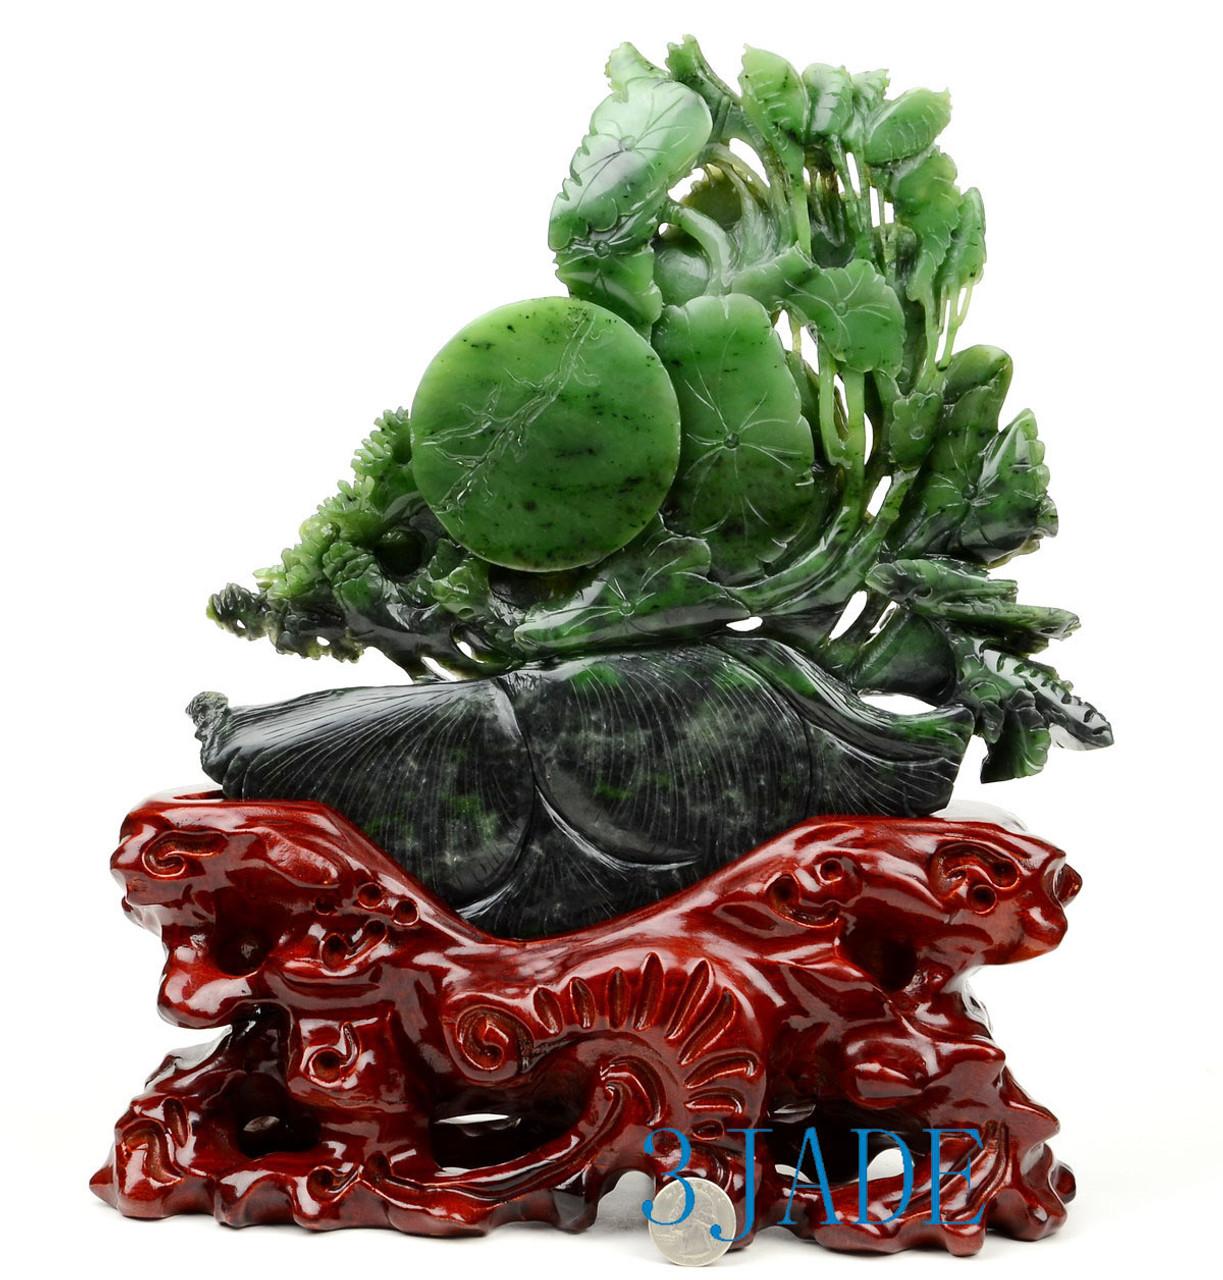 Green Nephrite Jade Lotus Seed Pod/Flower & Fish Sculpture East Asia/Chinese Artwork